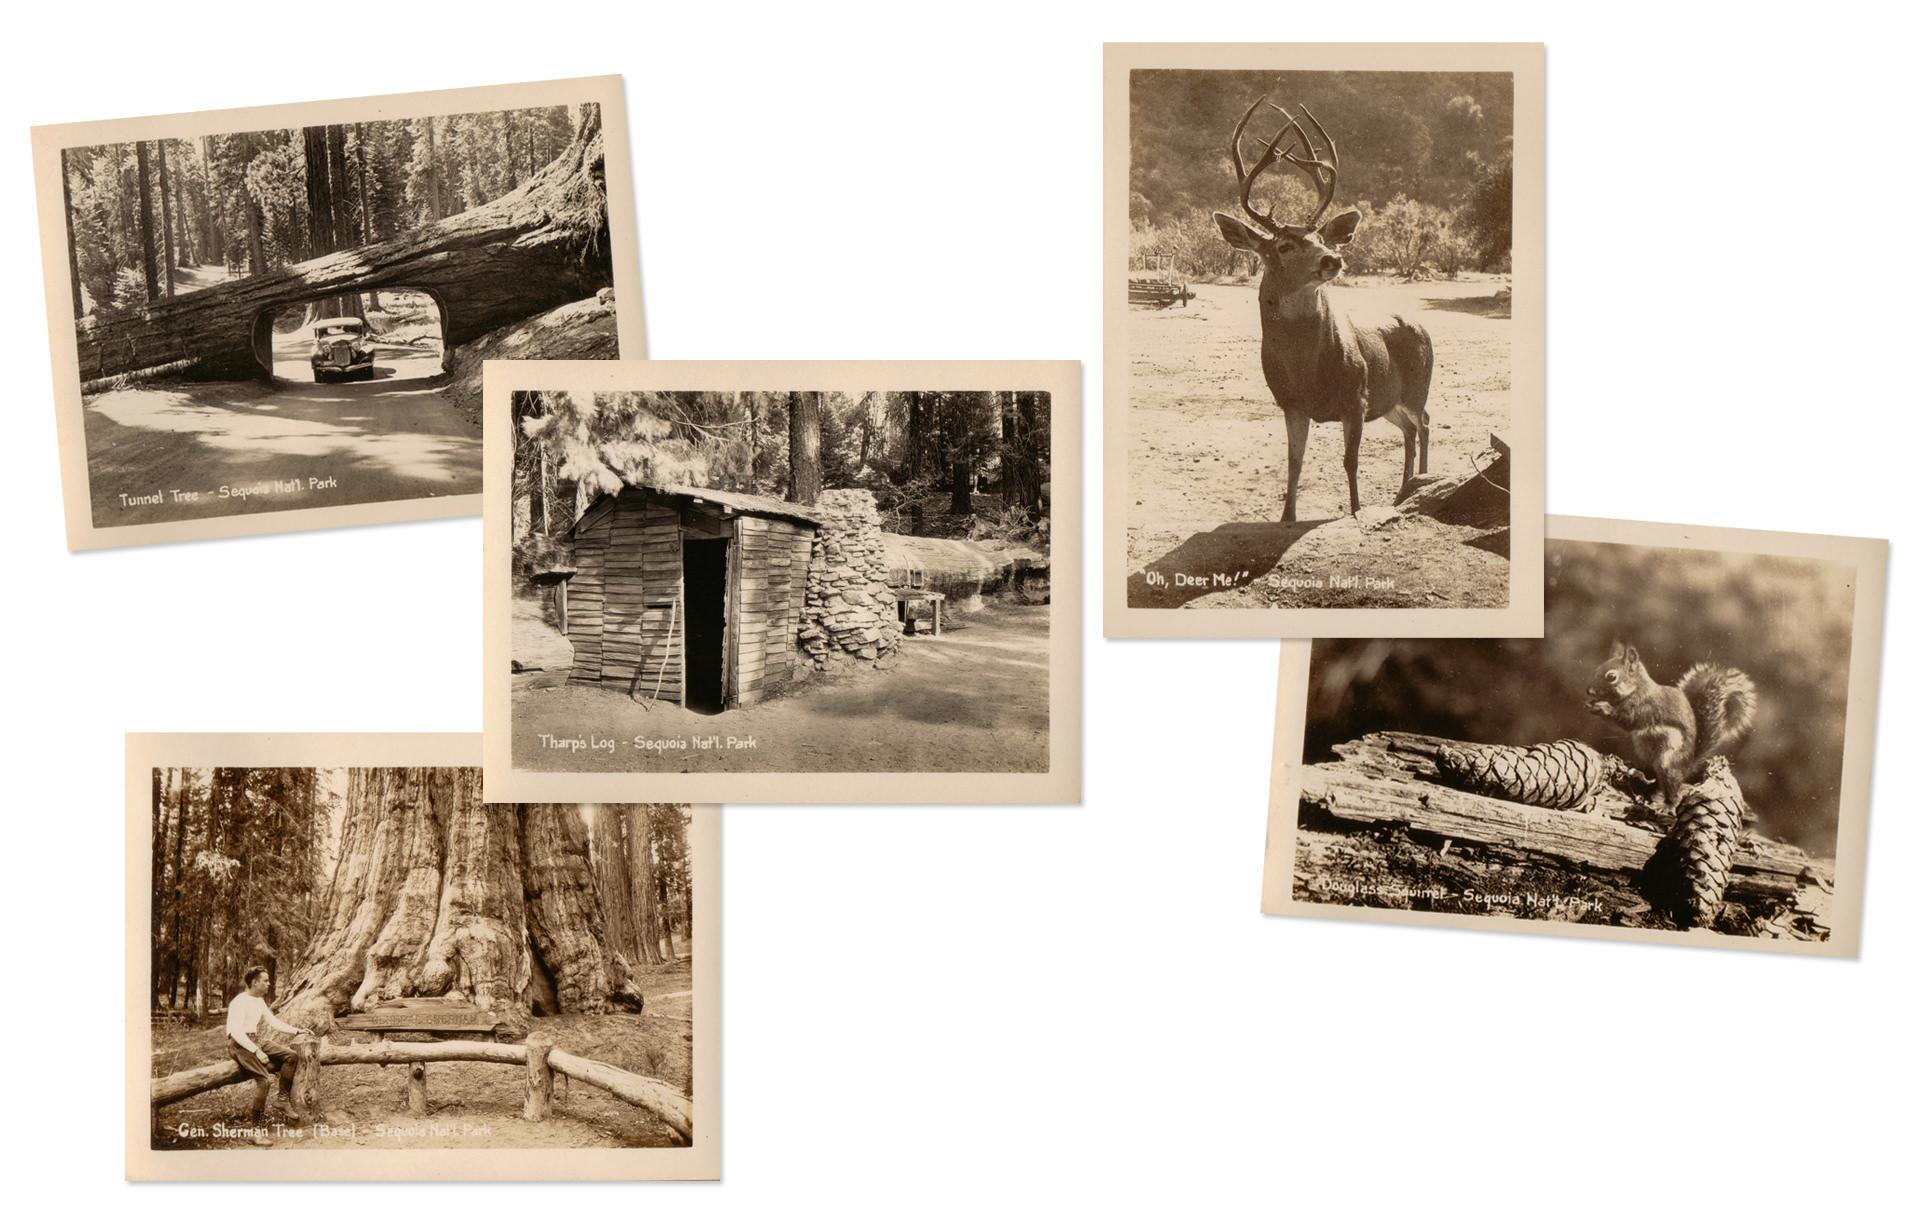 Sequoia National Park Vintage Photographs